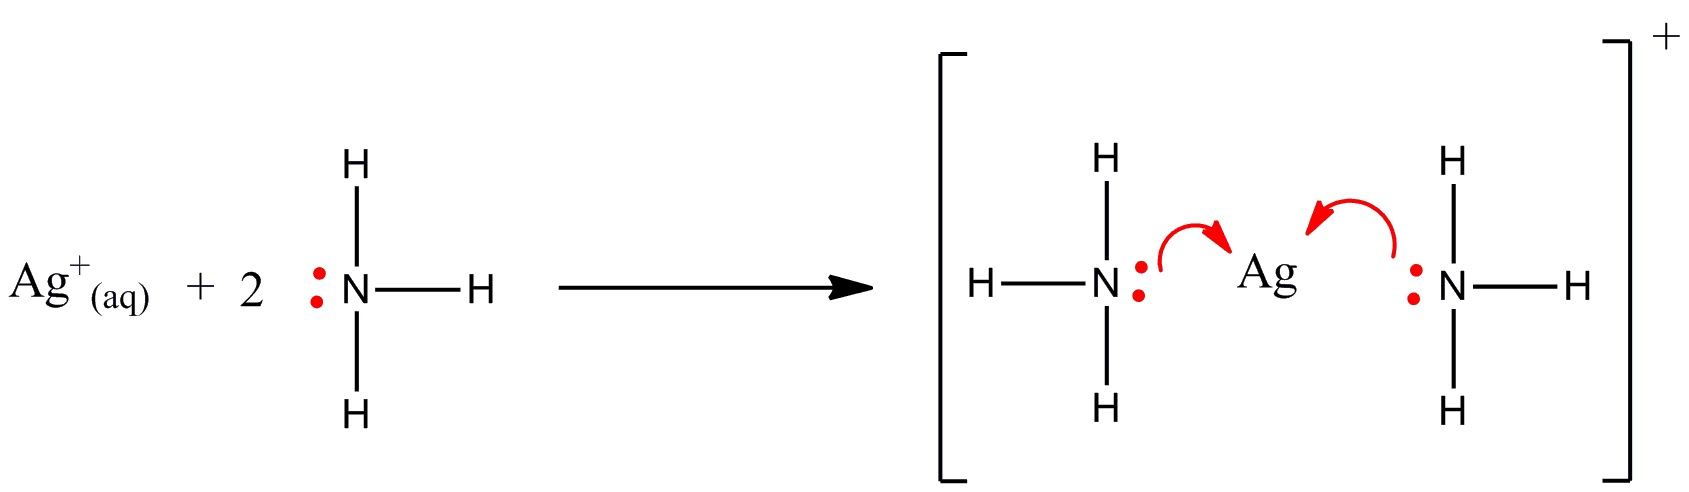 Ed03-kimia-4